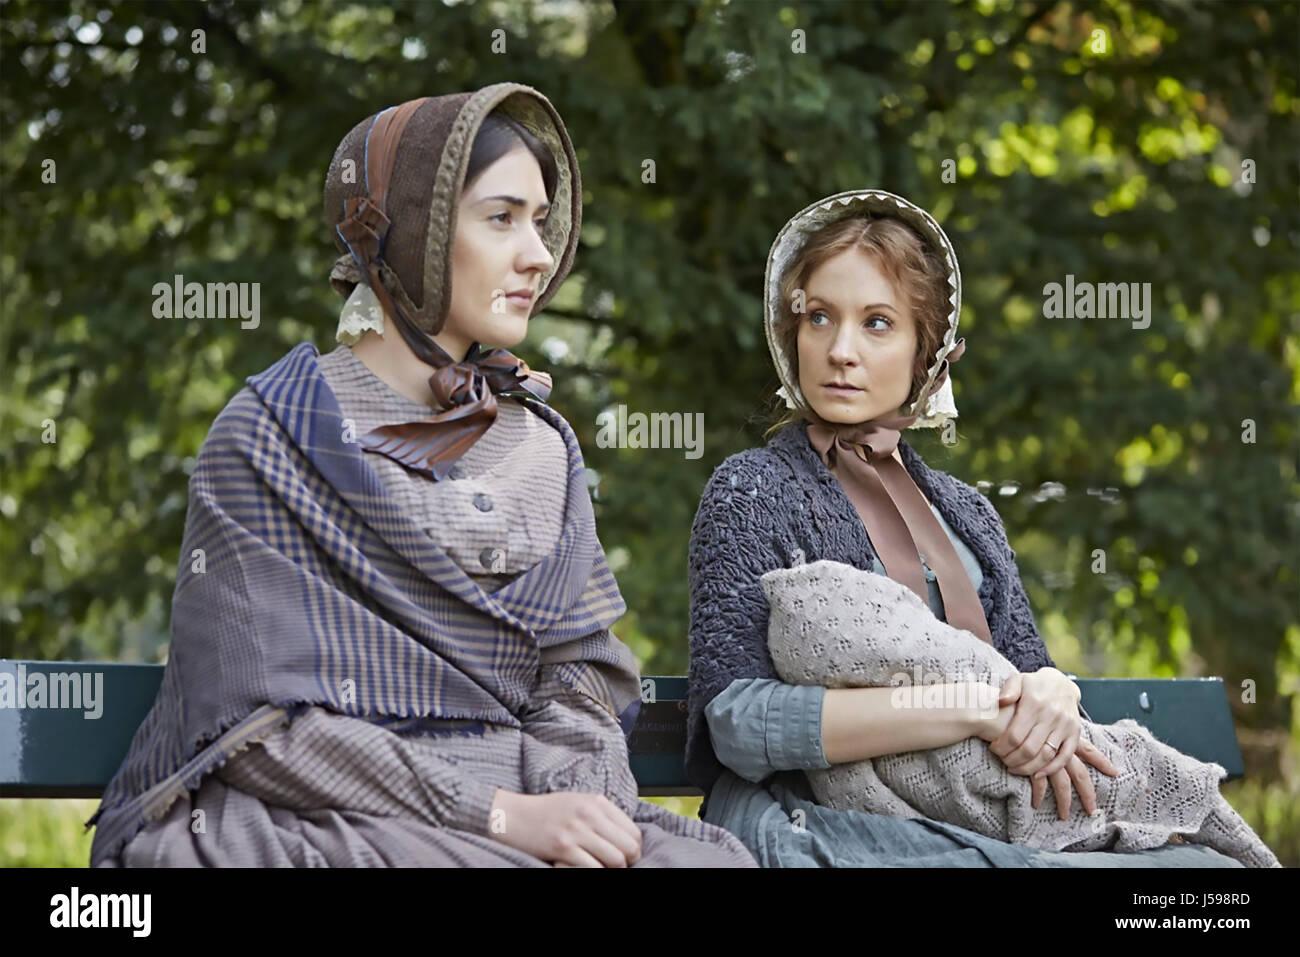 DARK ANGEL 2016 PBS film with Joanne Froggatt at right and Laura Morgan - Stock Image